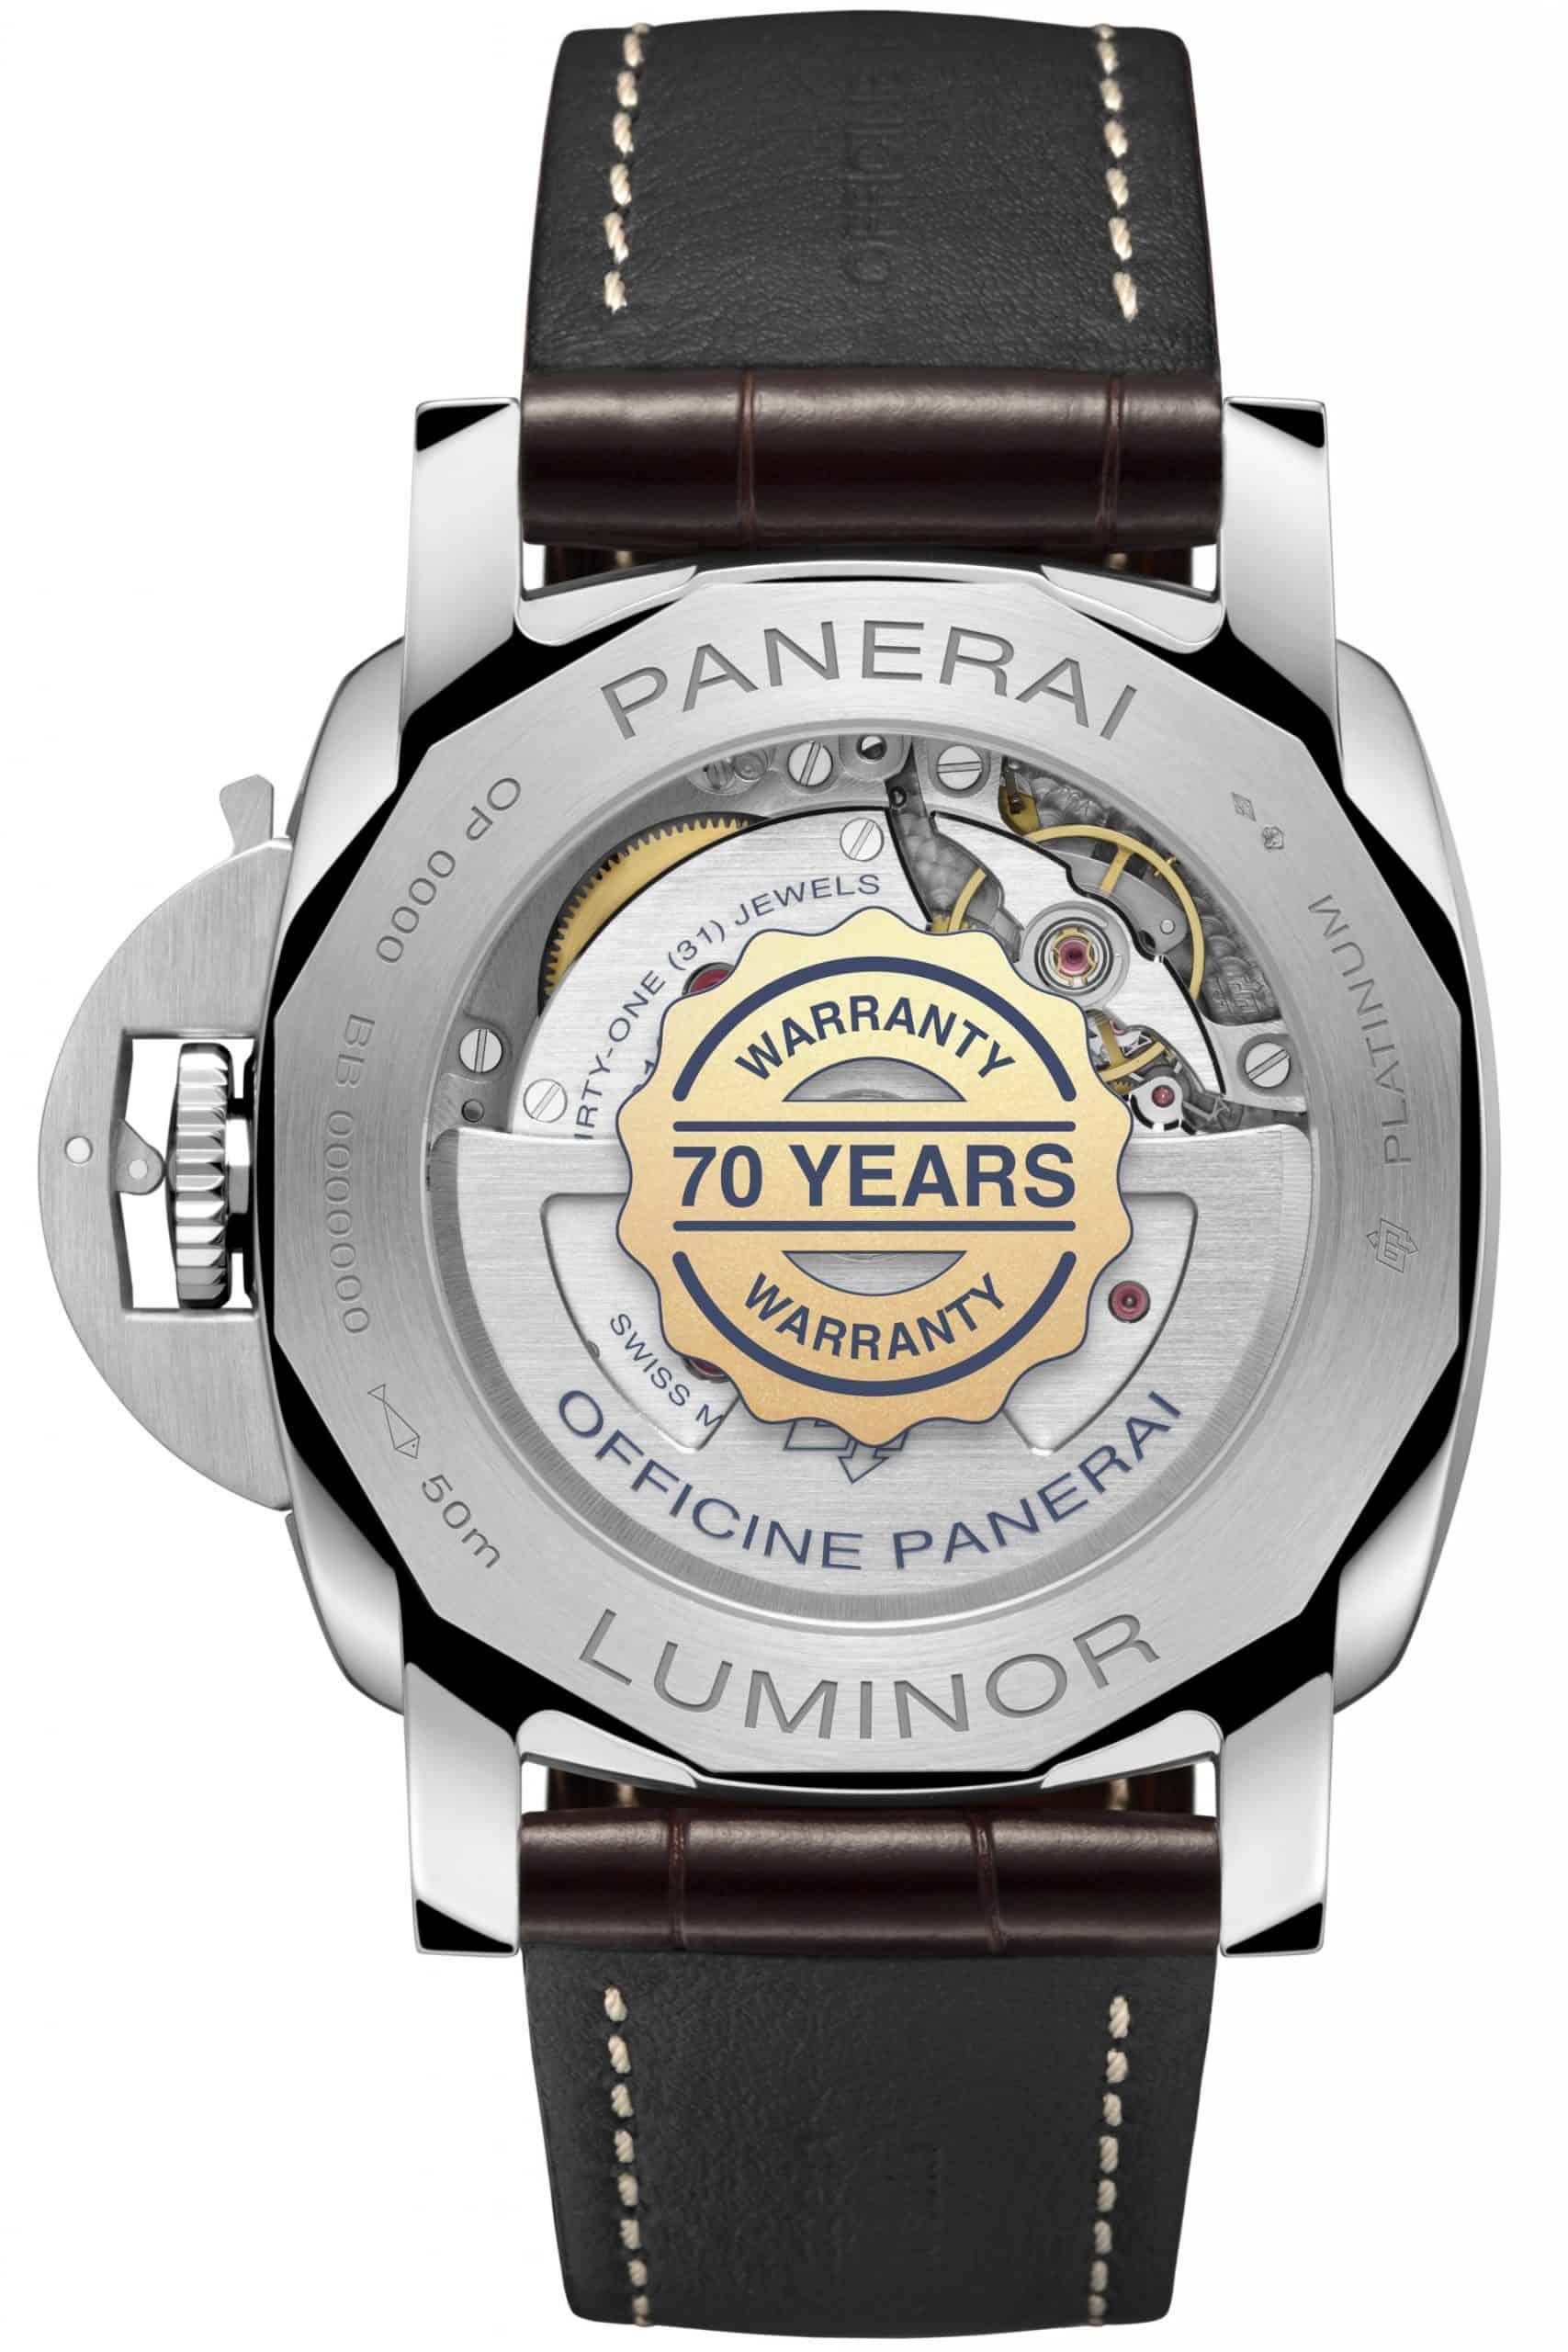 Platinumtech Luminor Marina 70 Jahre Garantie